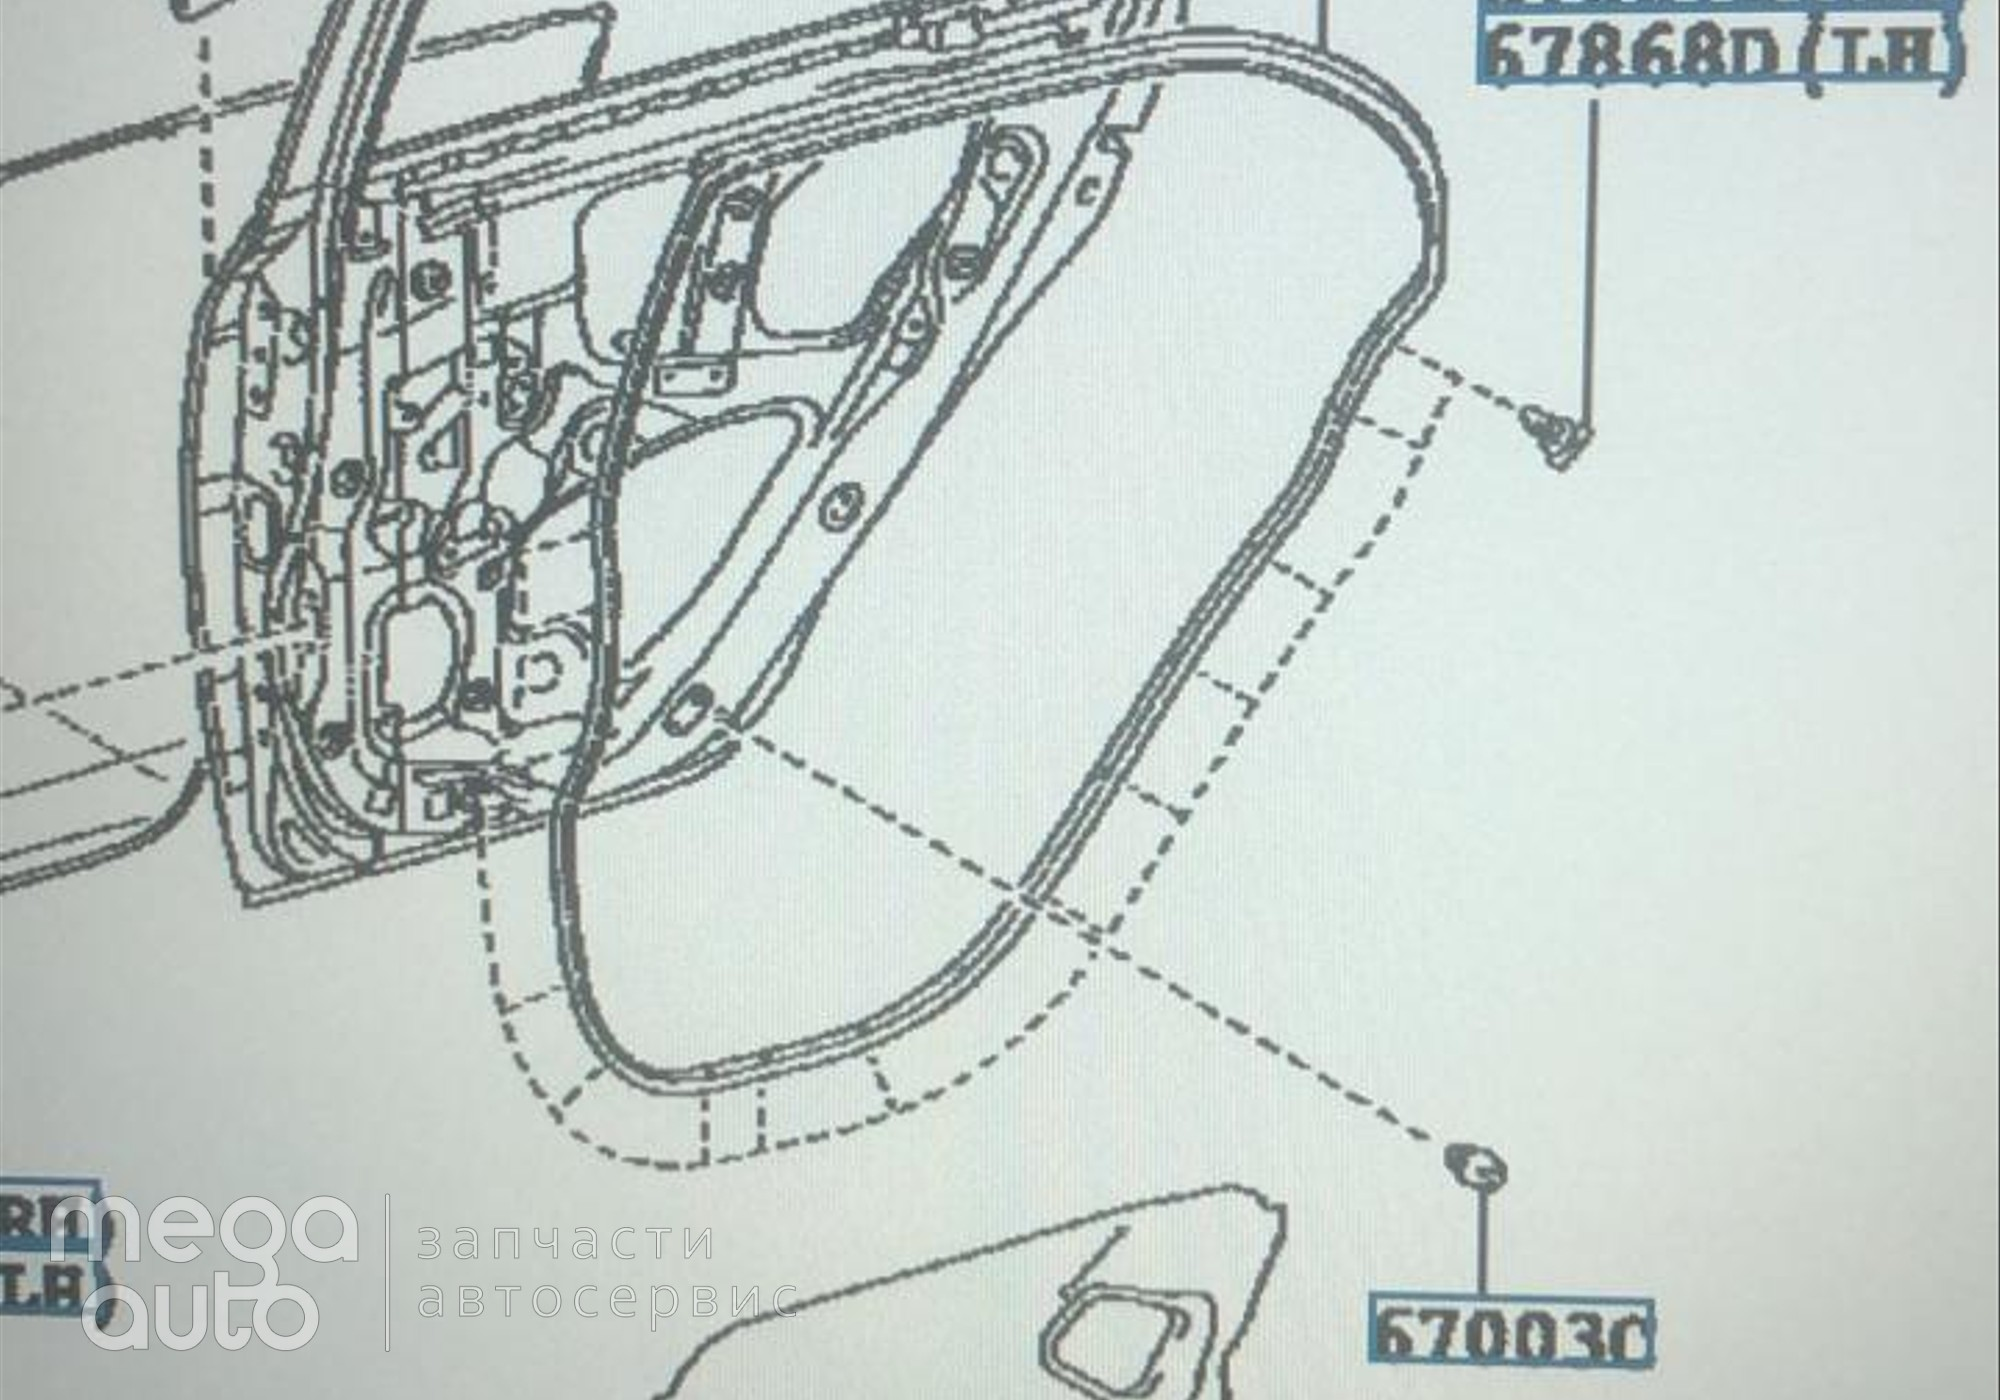 6787112530 Упл-ль двери правый для Toyota Corolla E140/E150 (с 2007 по 2013)